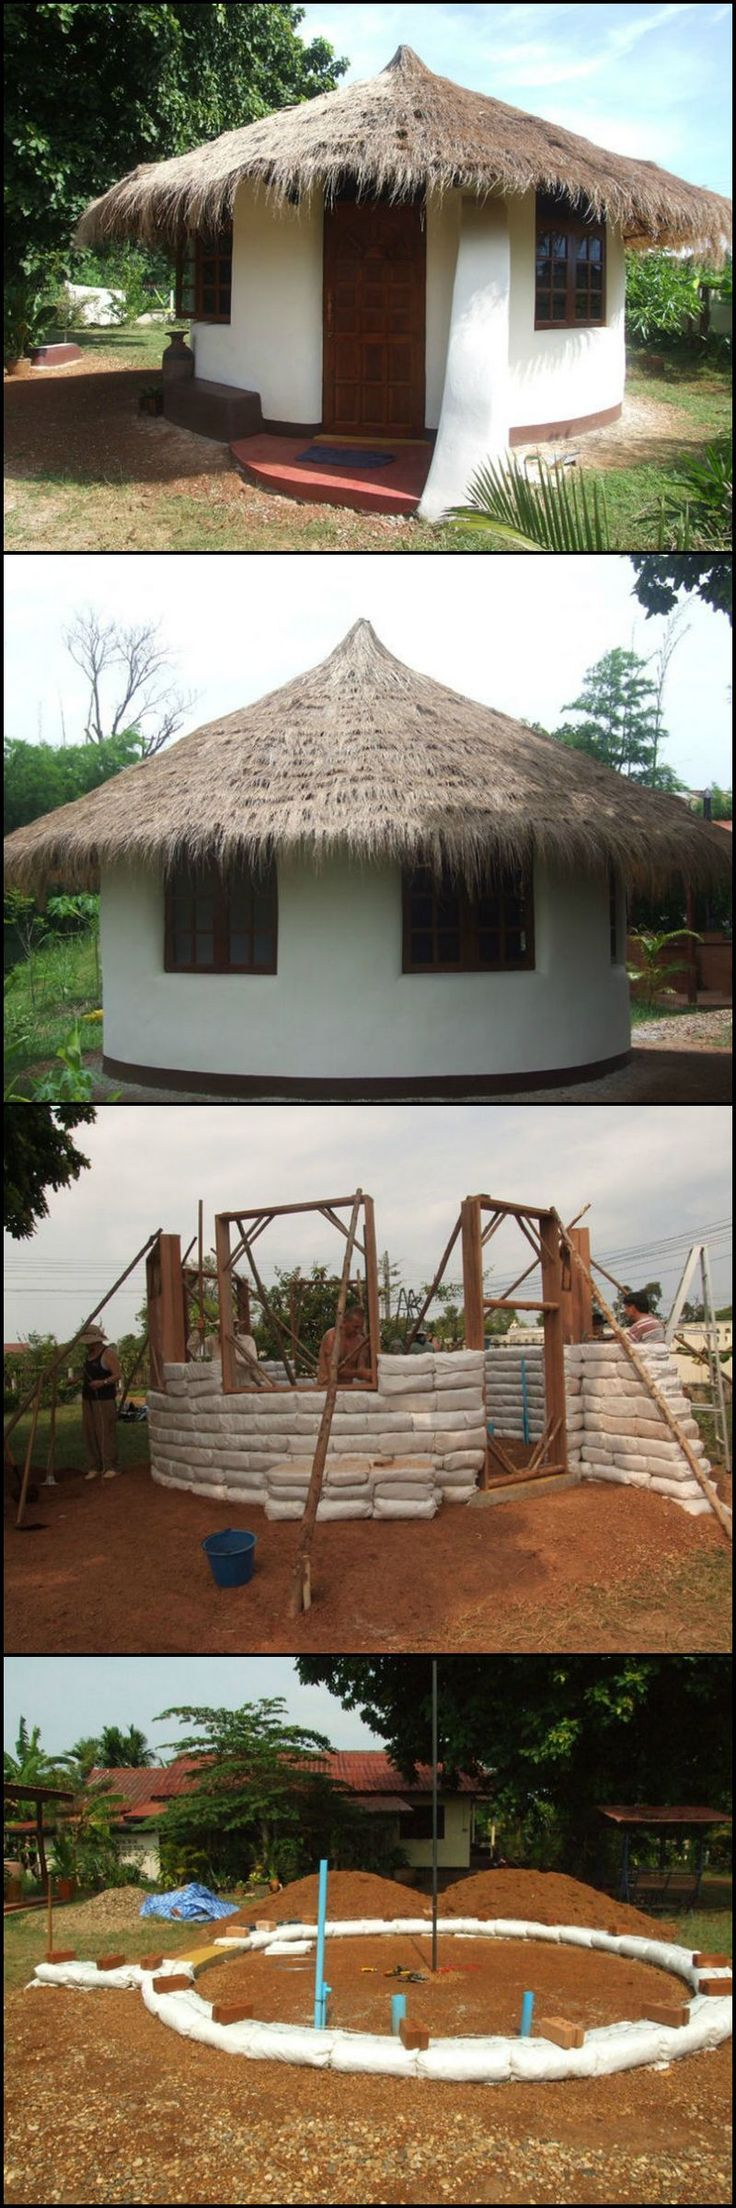 Diy earthbag round house superadobe casas y adobe for Diy adobe house